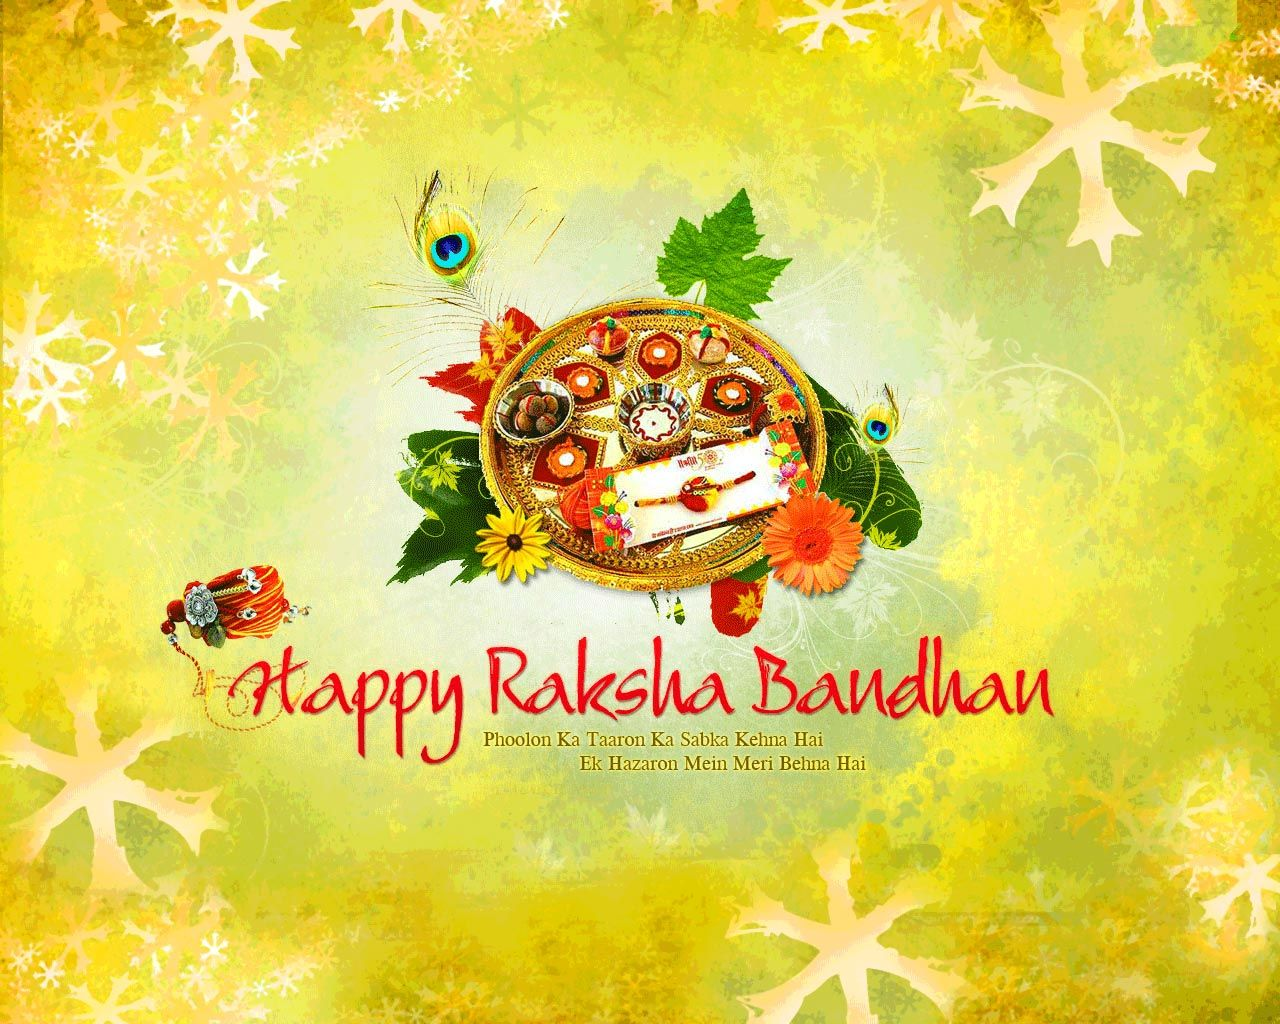 Raksha Bandhan Wallpapers Images Photo For Facebook Raksha